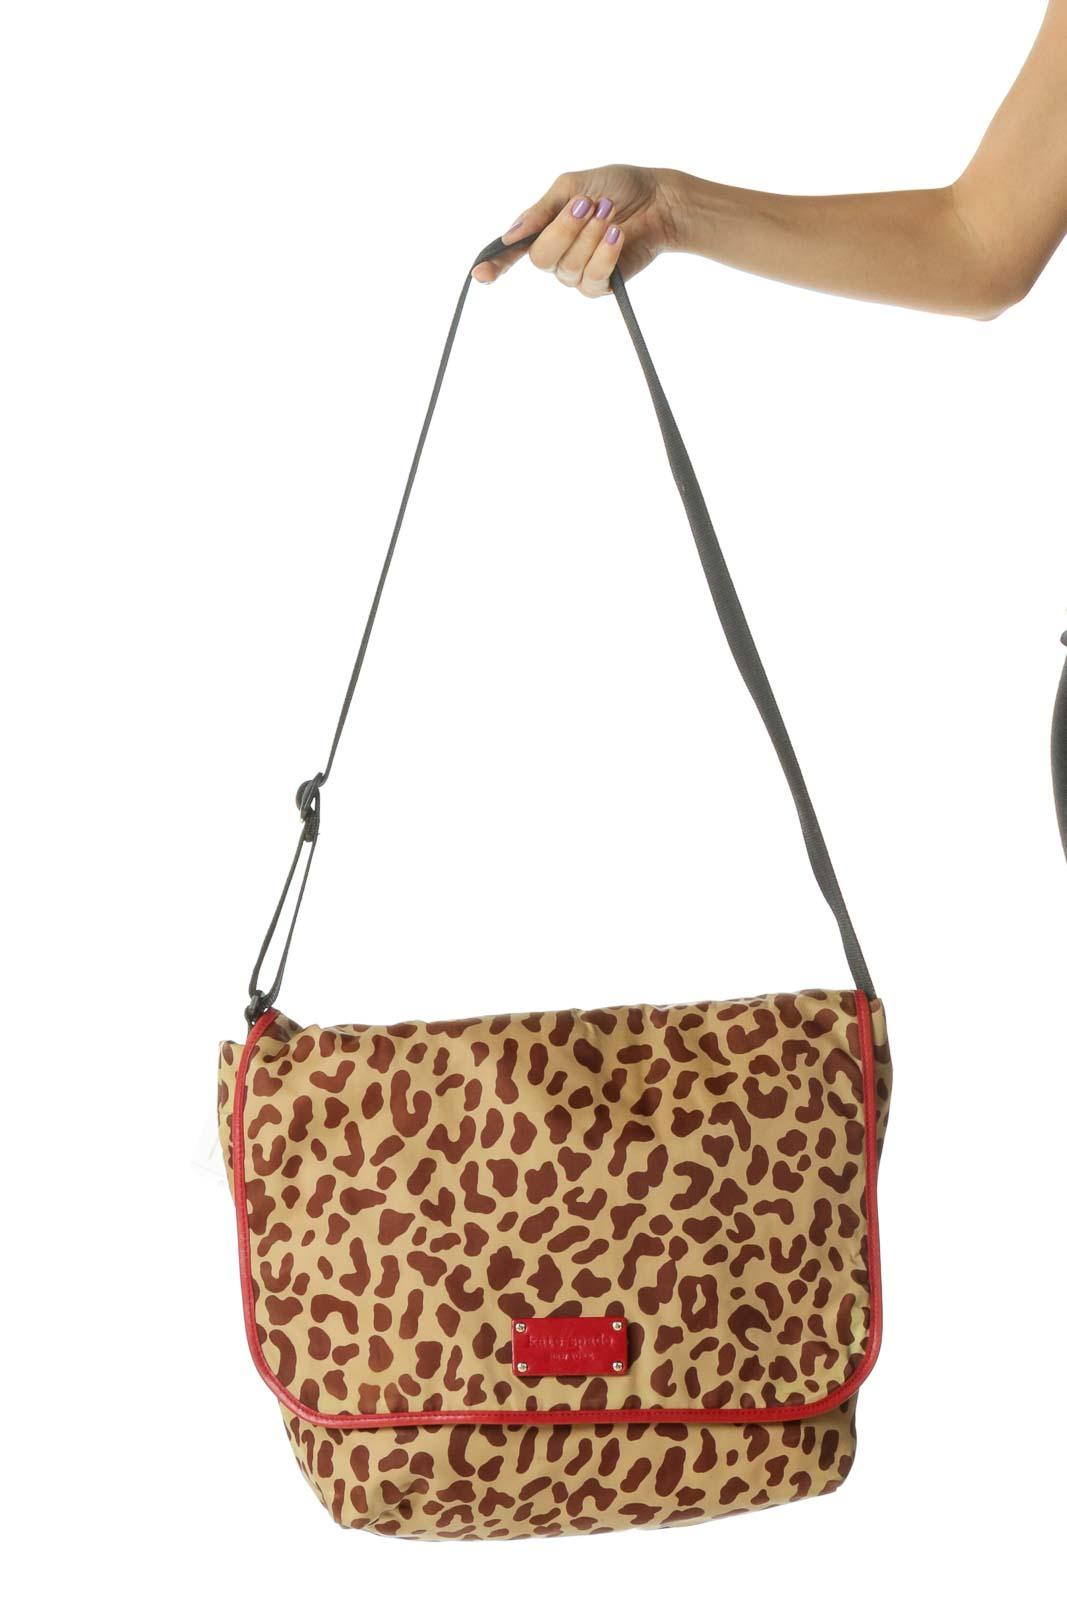 Brown and Red Cheetah Print Messenger Bag